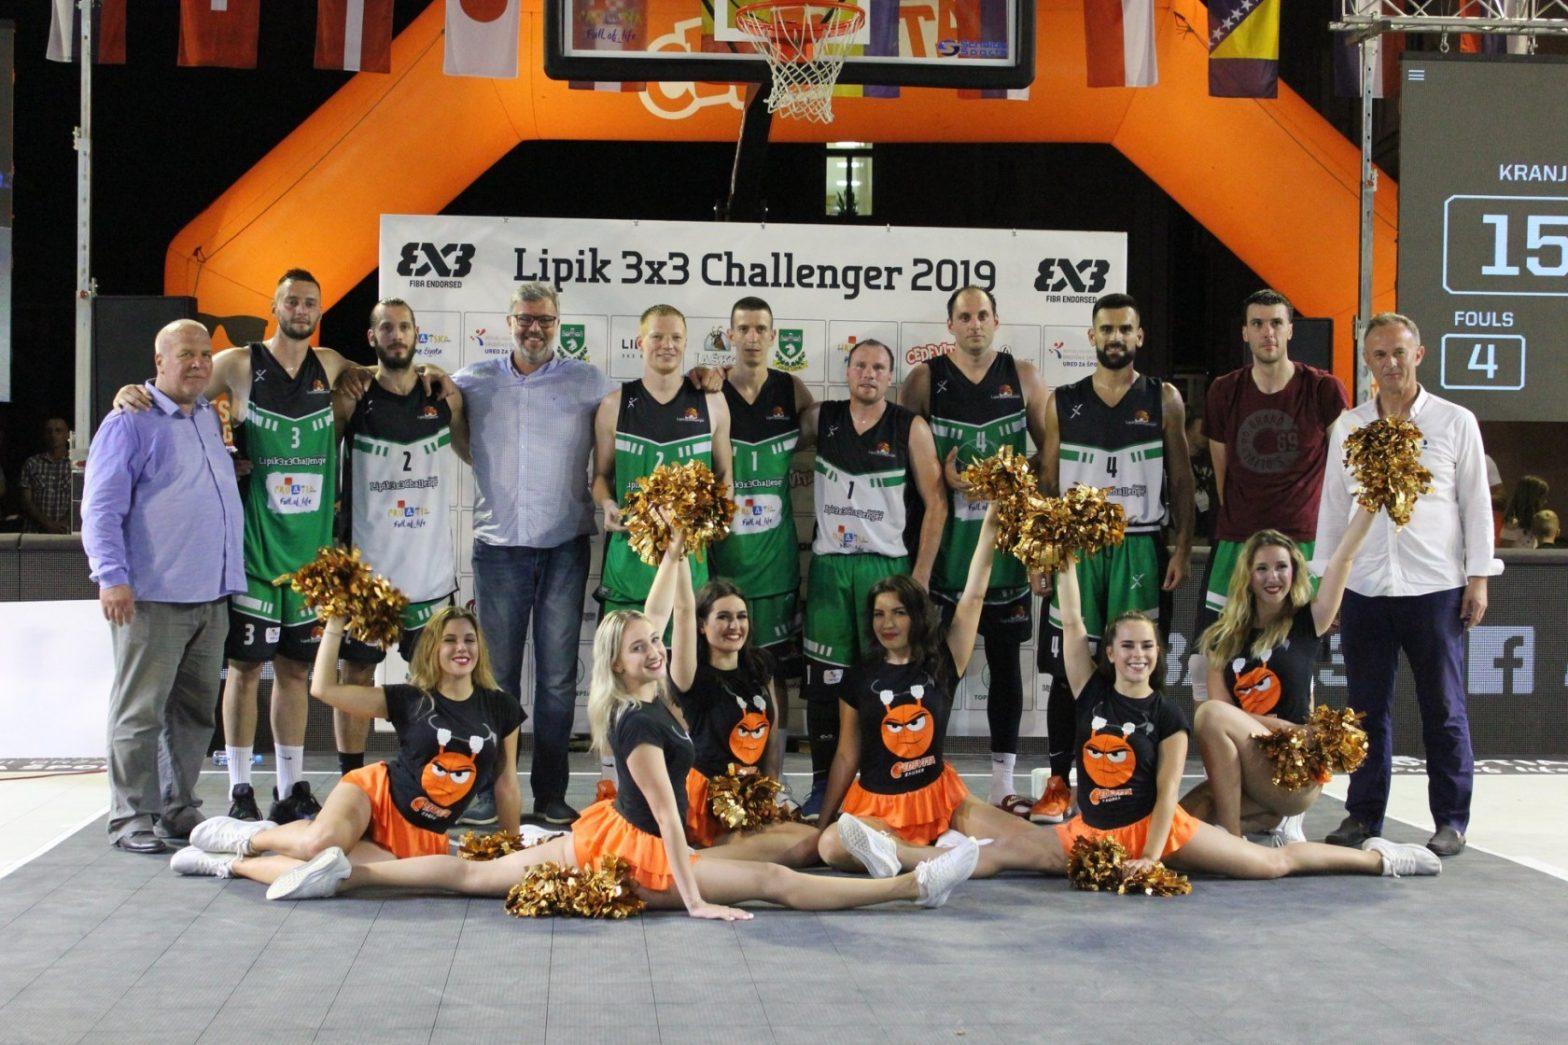 Ekipa Vrbas osvojila turnir u Lipiku